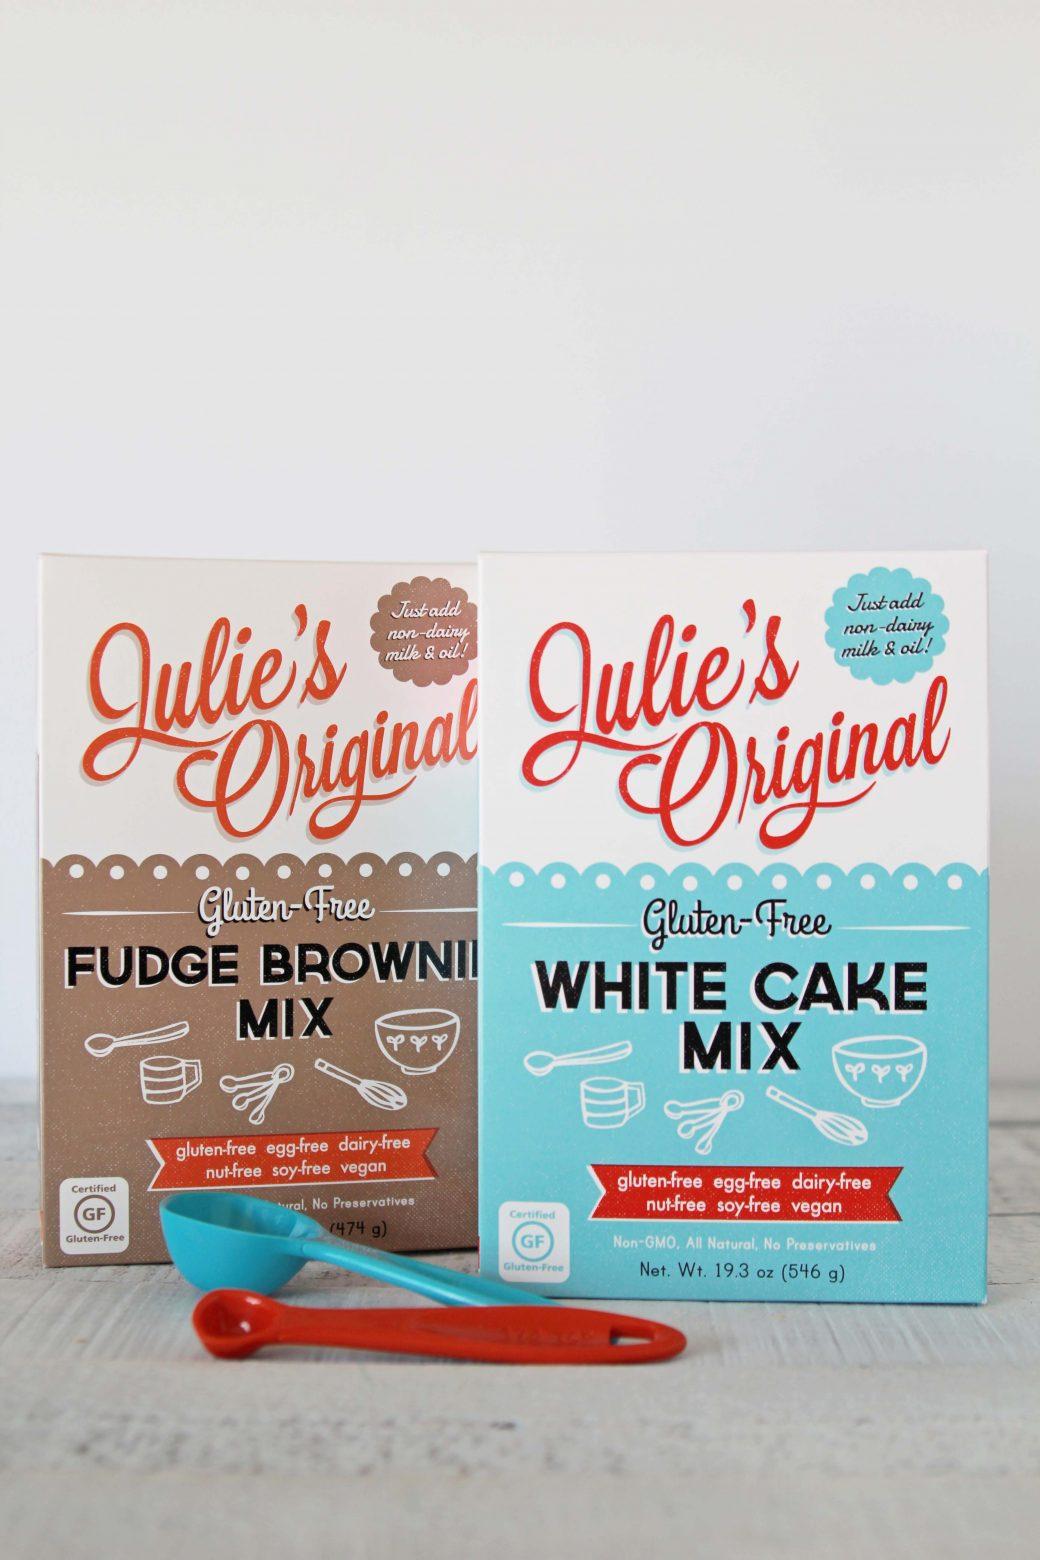 A photo of Julie's Original White Cake and Brownie Mix Gluten-Free + Vegan